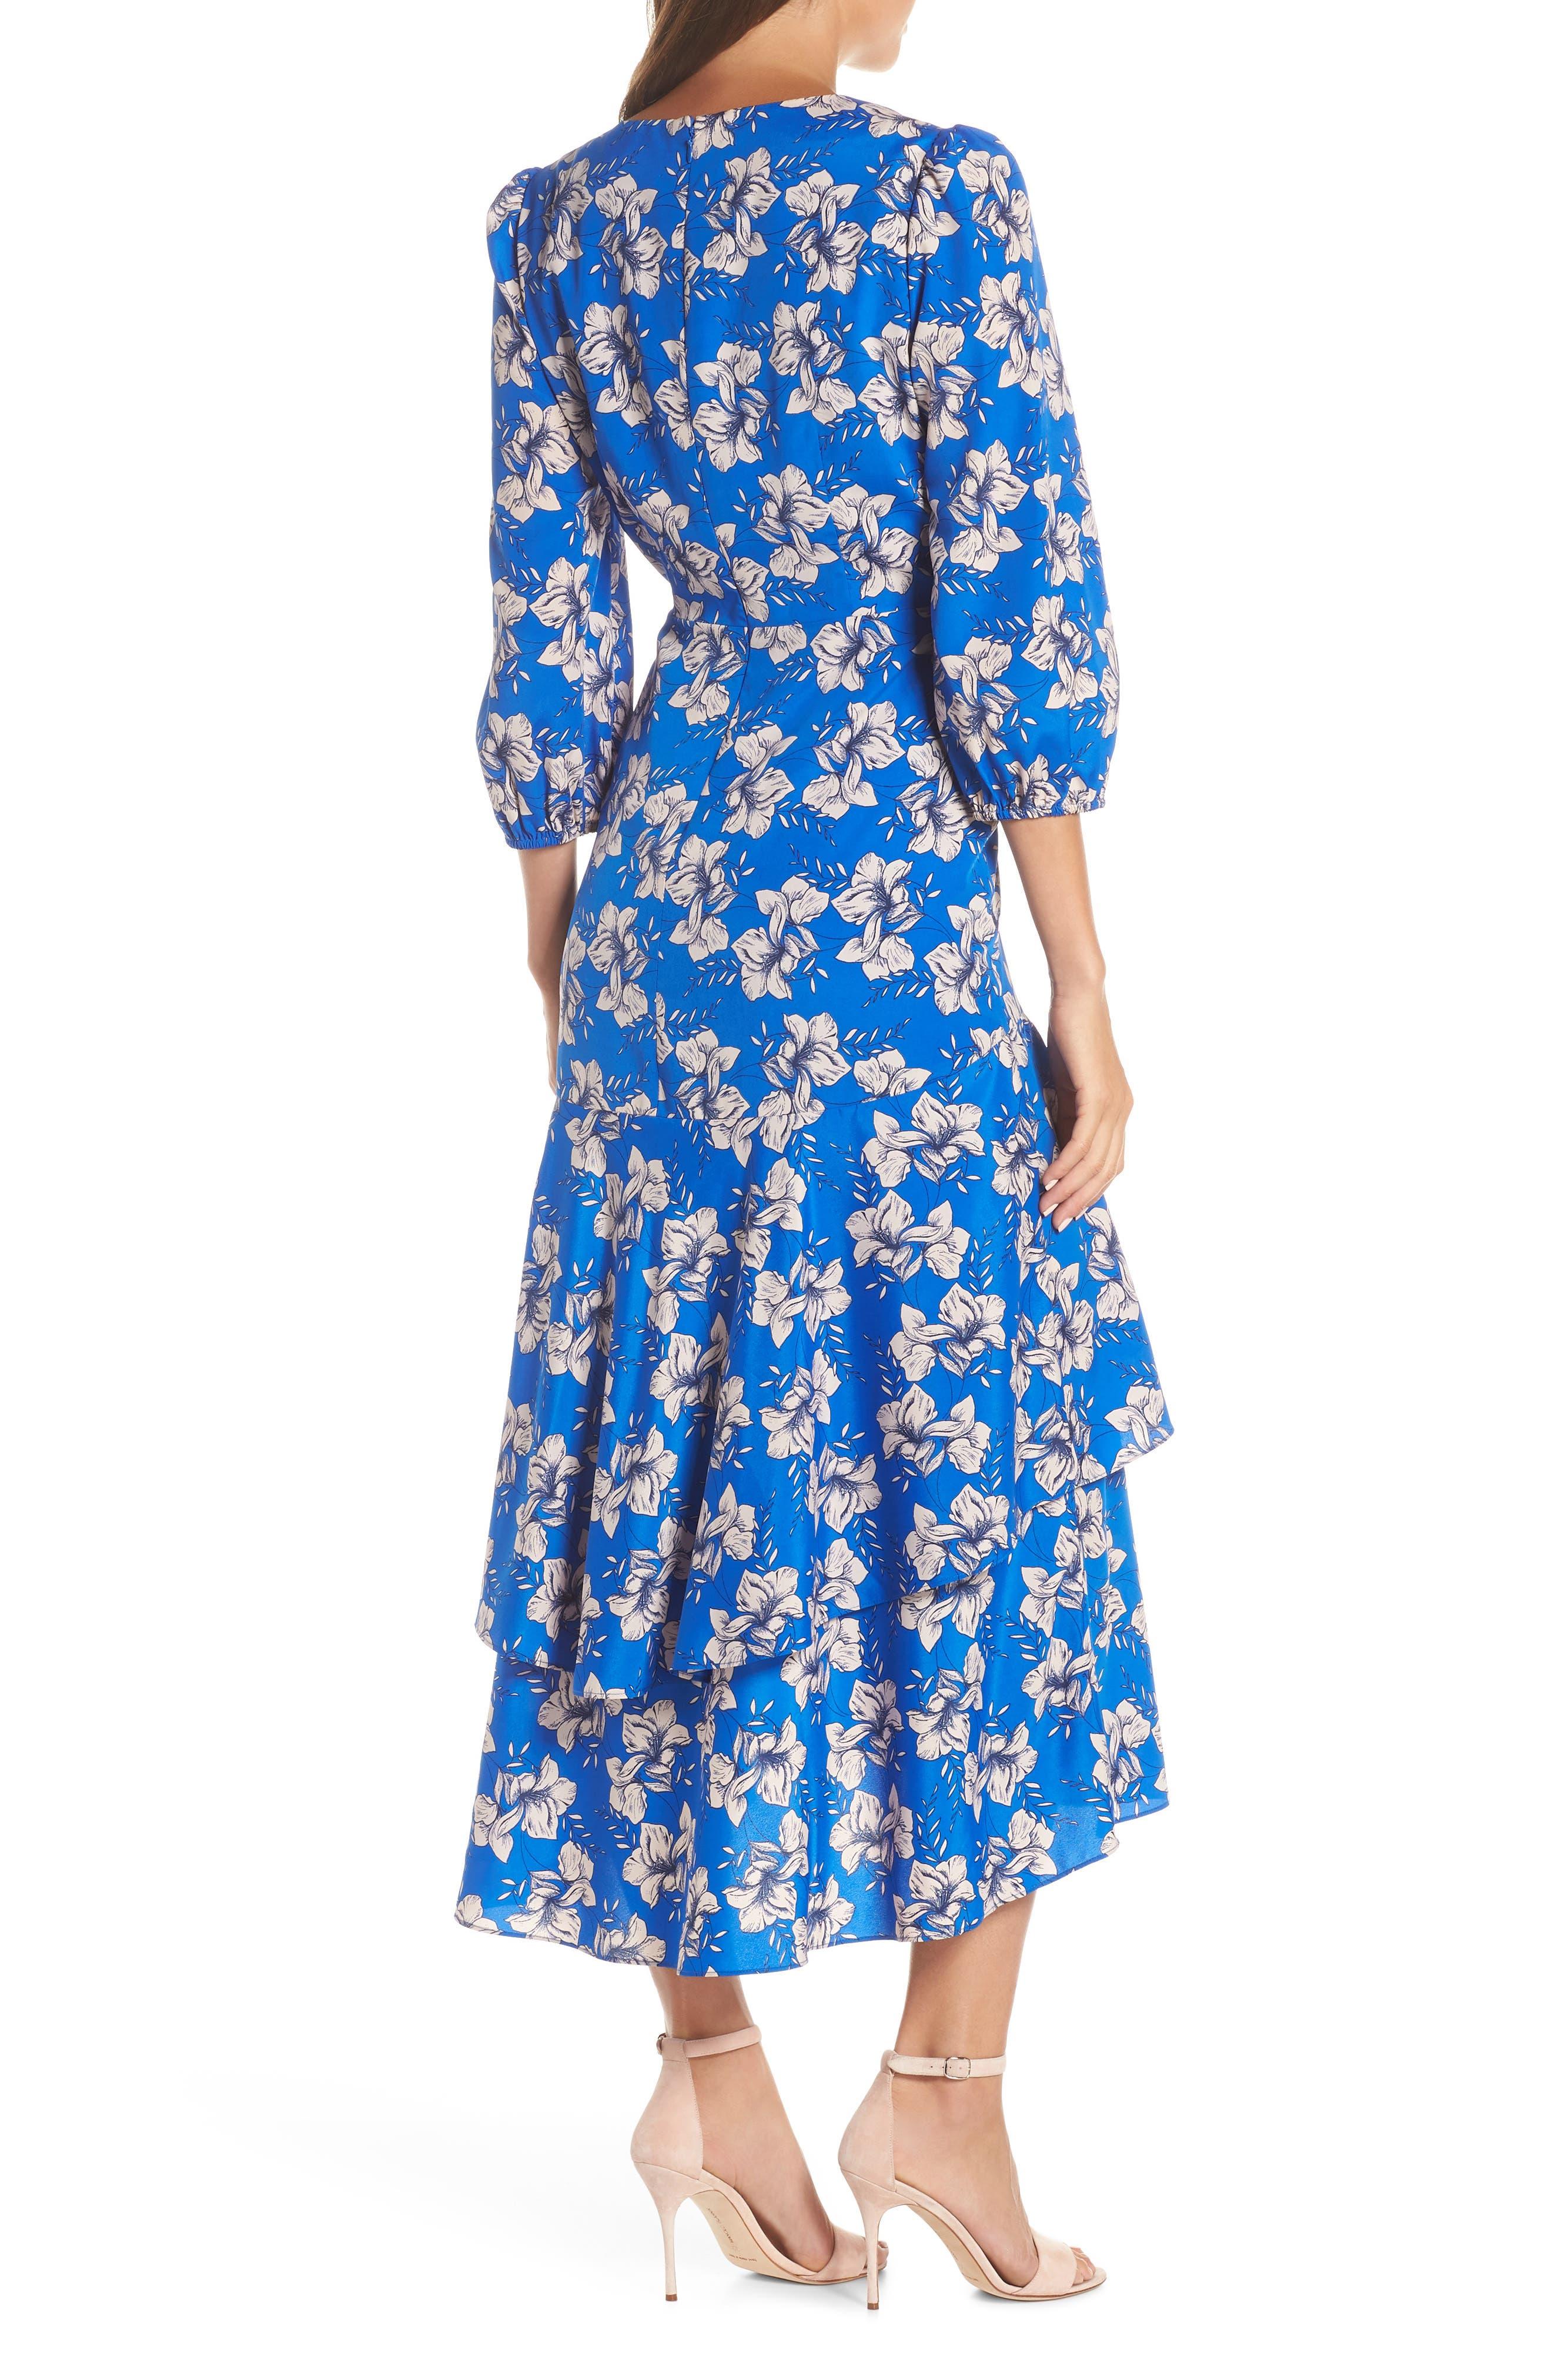 ELIZA J, Faux Wrap Maxi Dress, Alternate thumbnail 2, color, BLUE